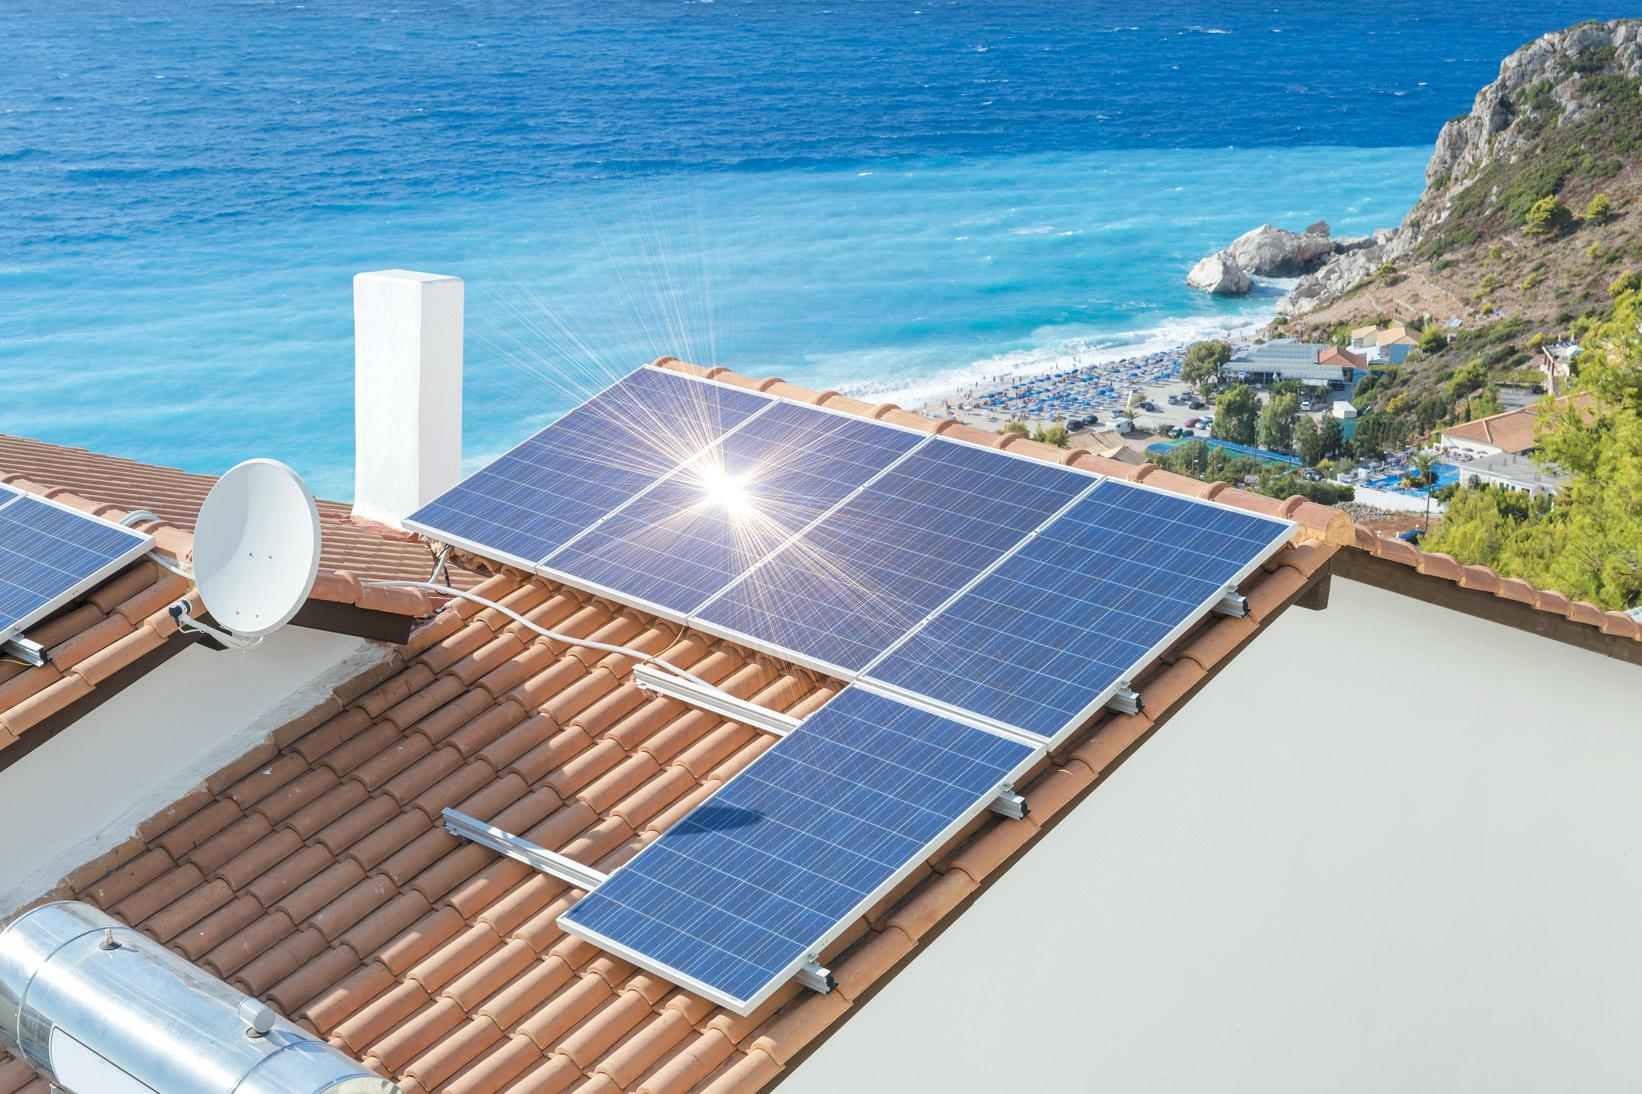 impianto fotovoltaico a isola